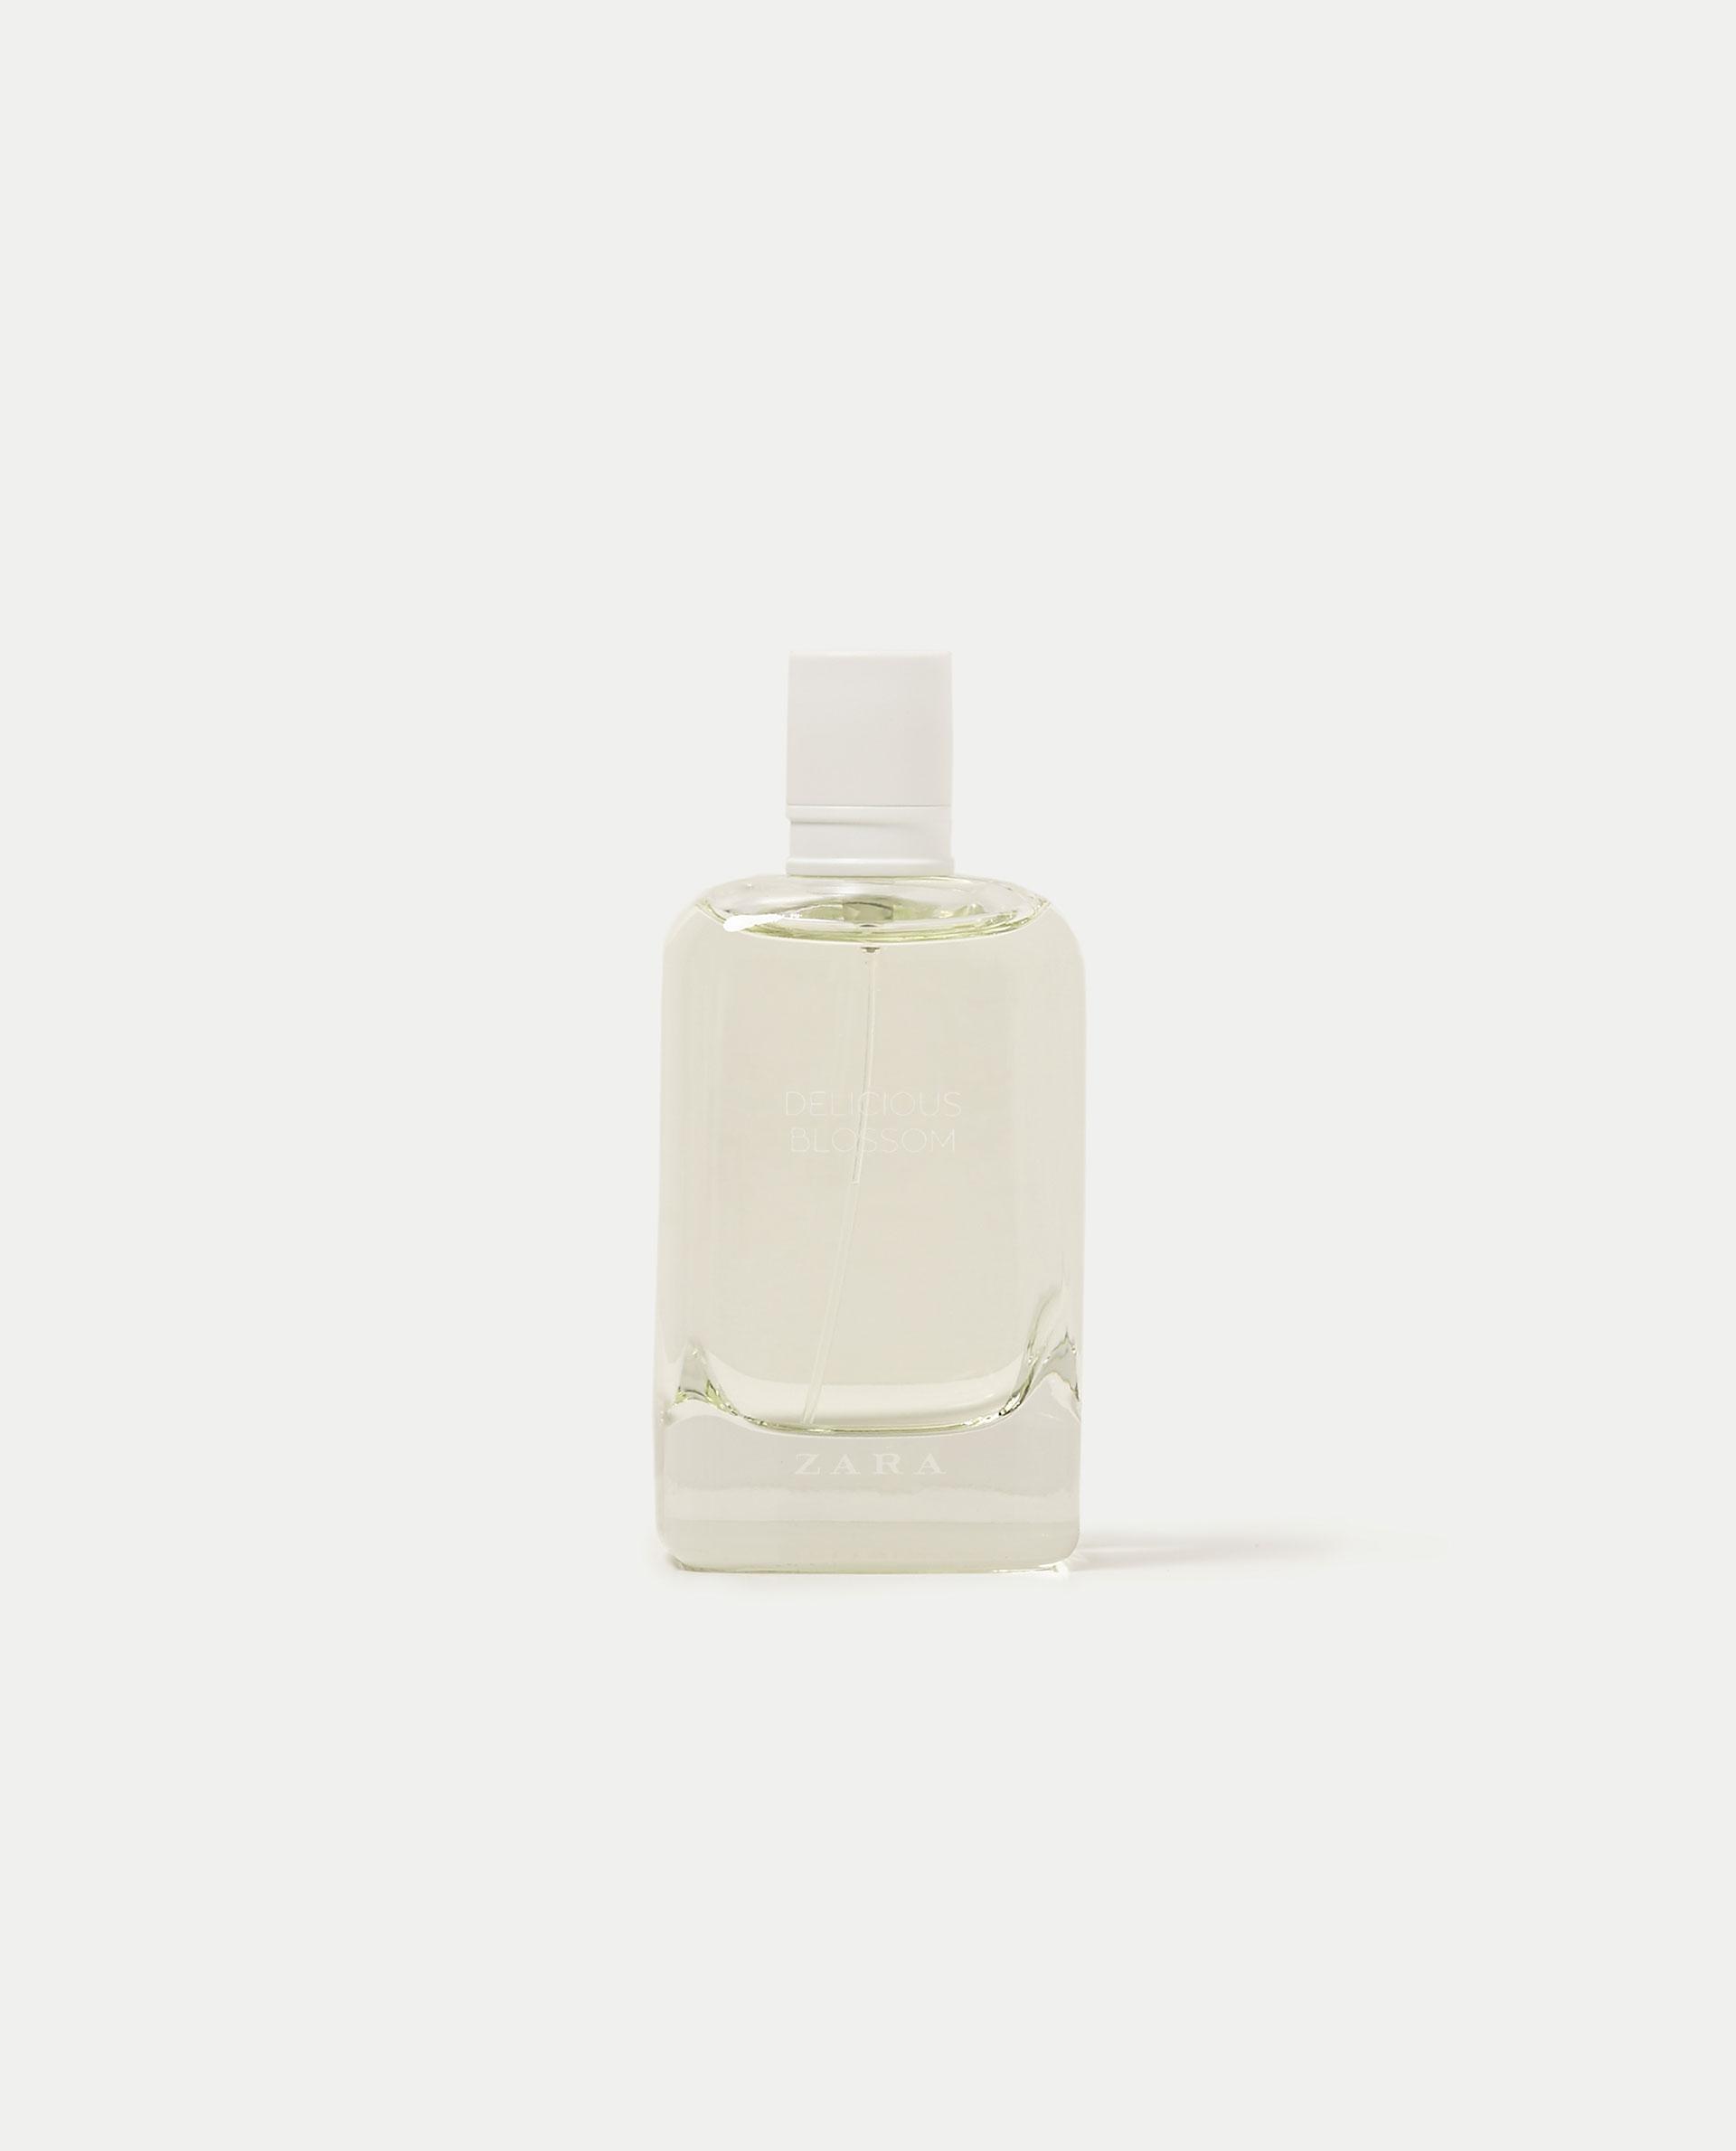 Parfum Nouveau 2017 Pour Zara Un Blossom Delicious Femme v8nym0NwO